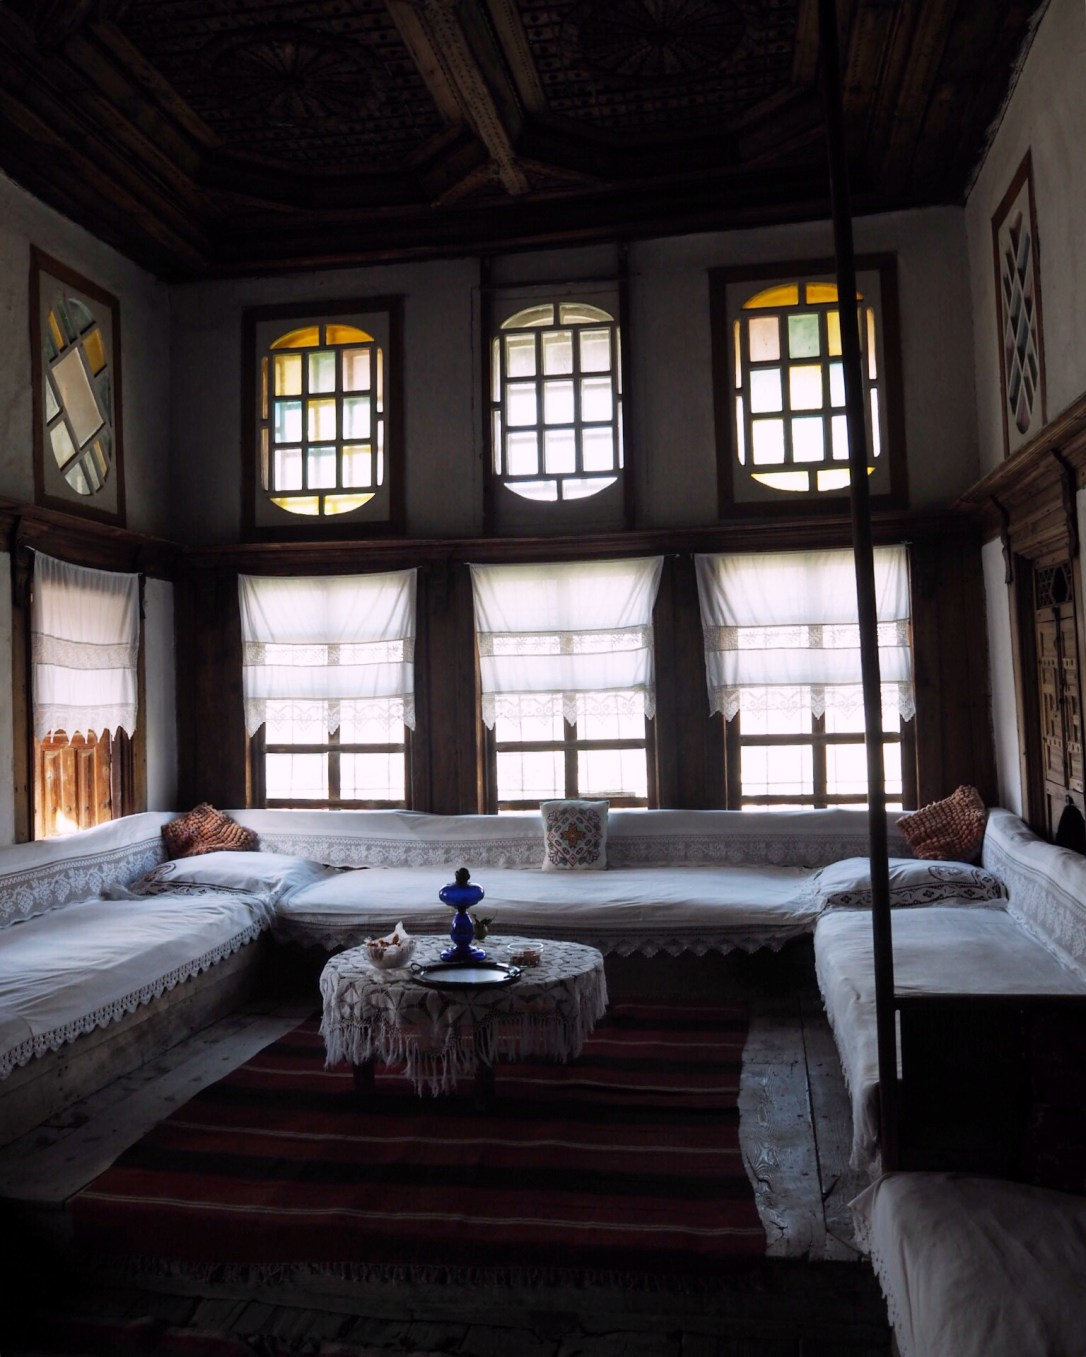 The beautiful Zekate House in Gjirokastër, Albania